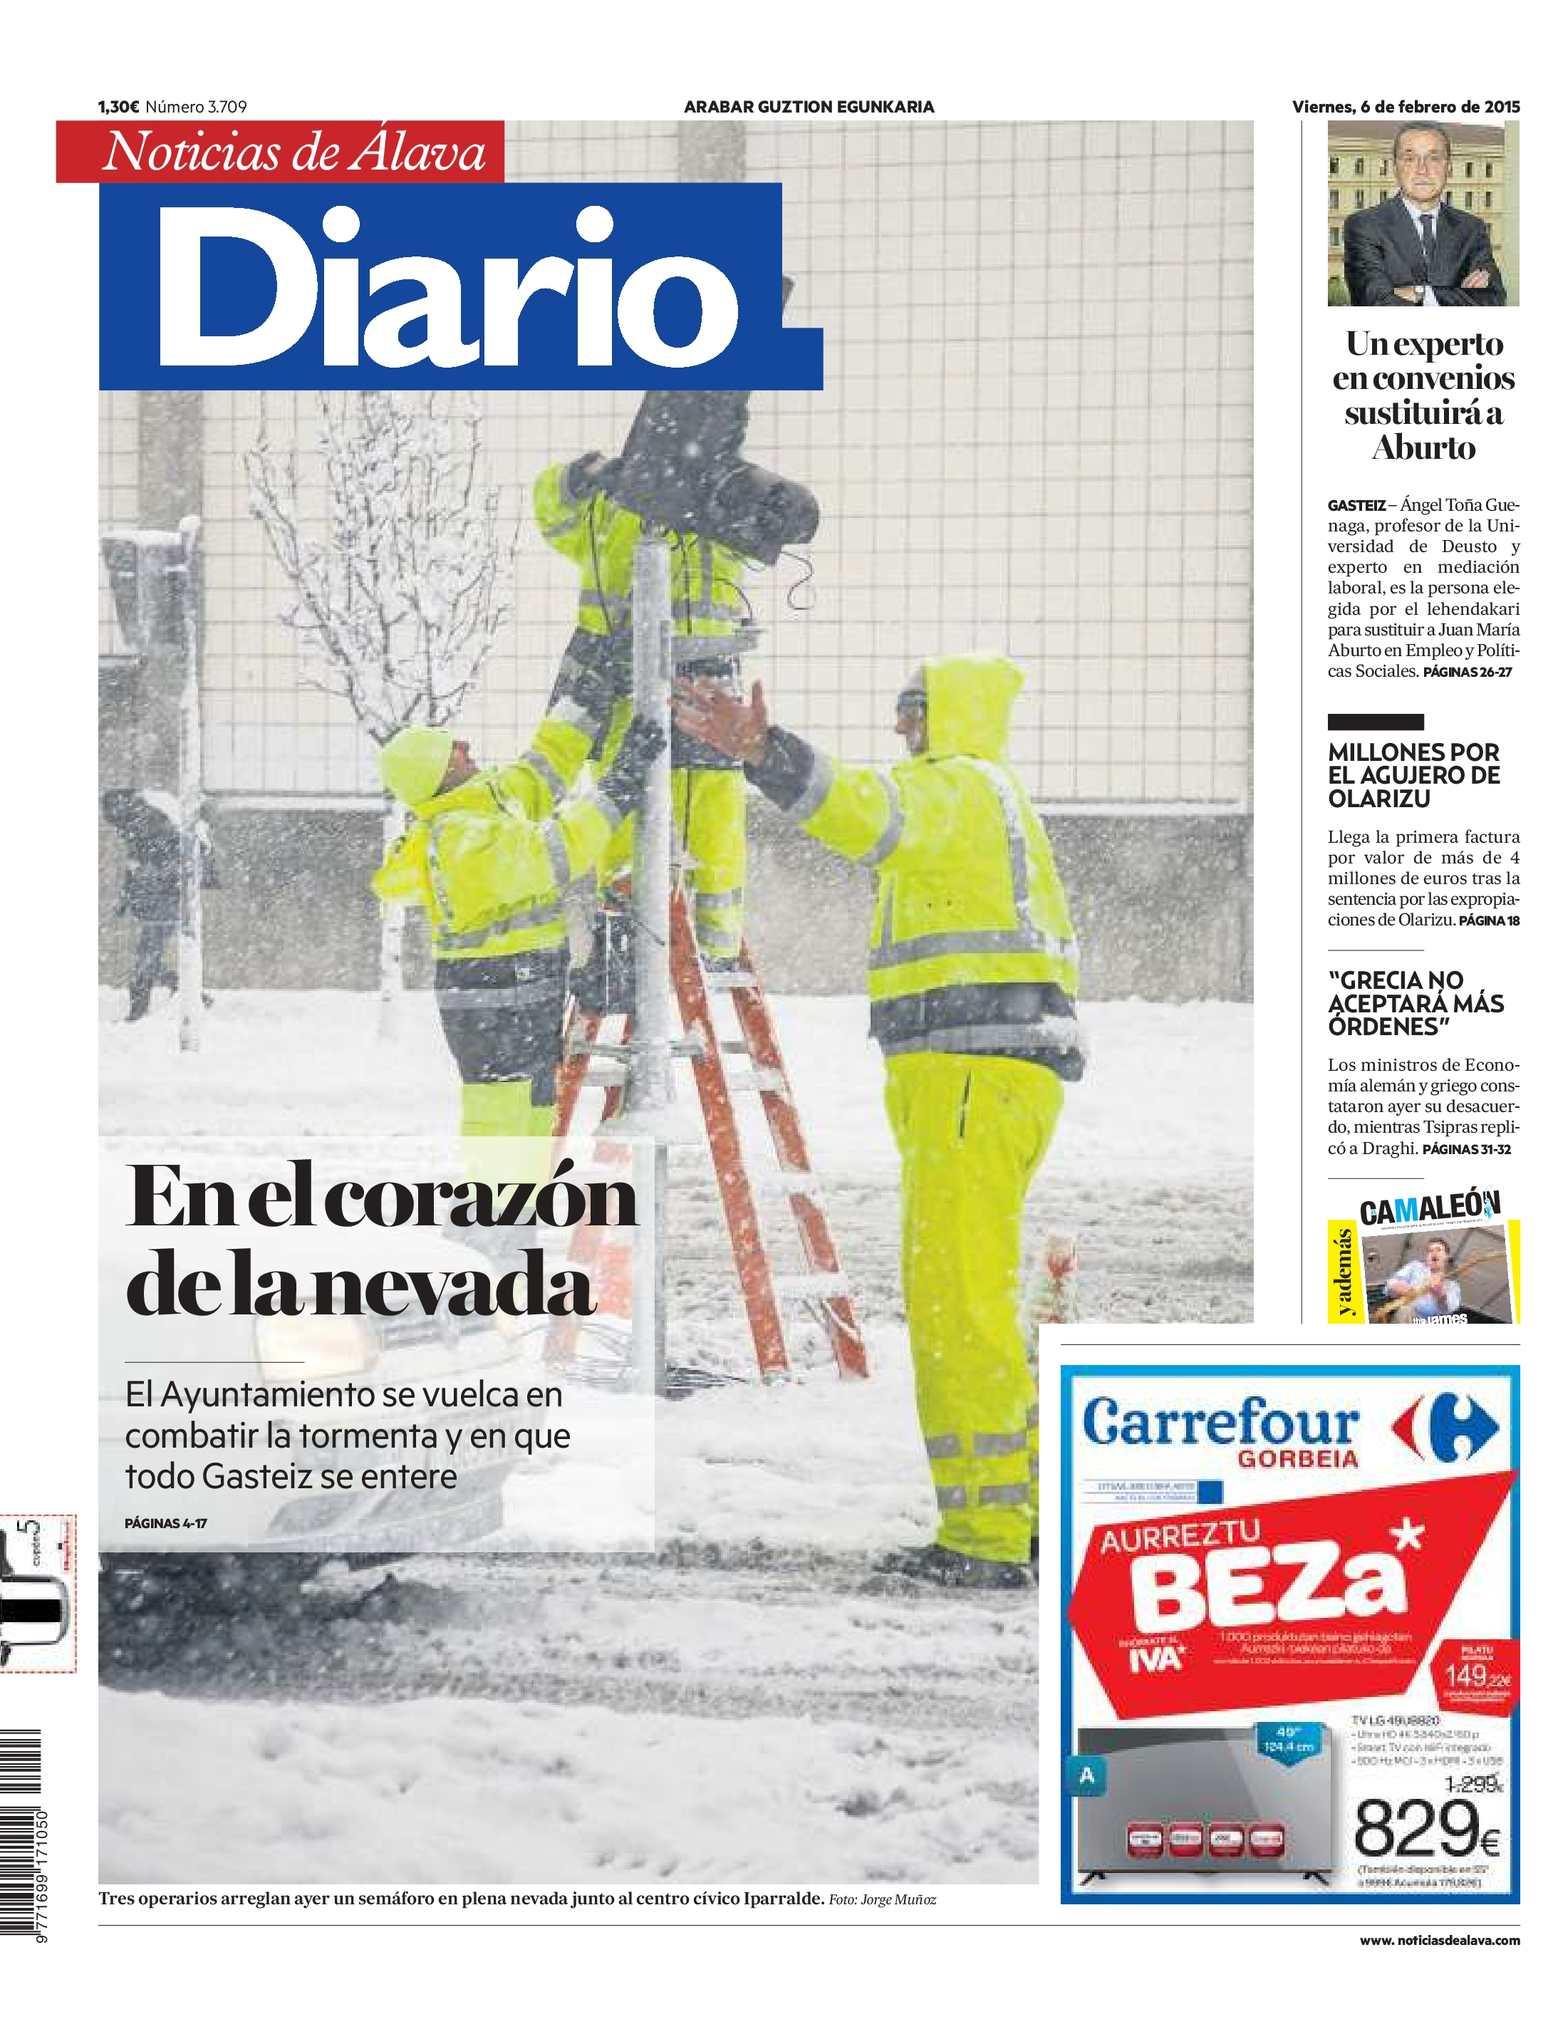 Diario de Noticias de Álava 20150206